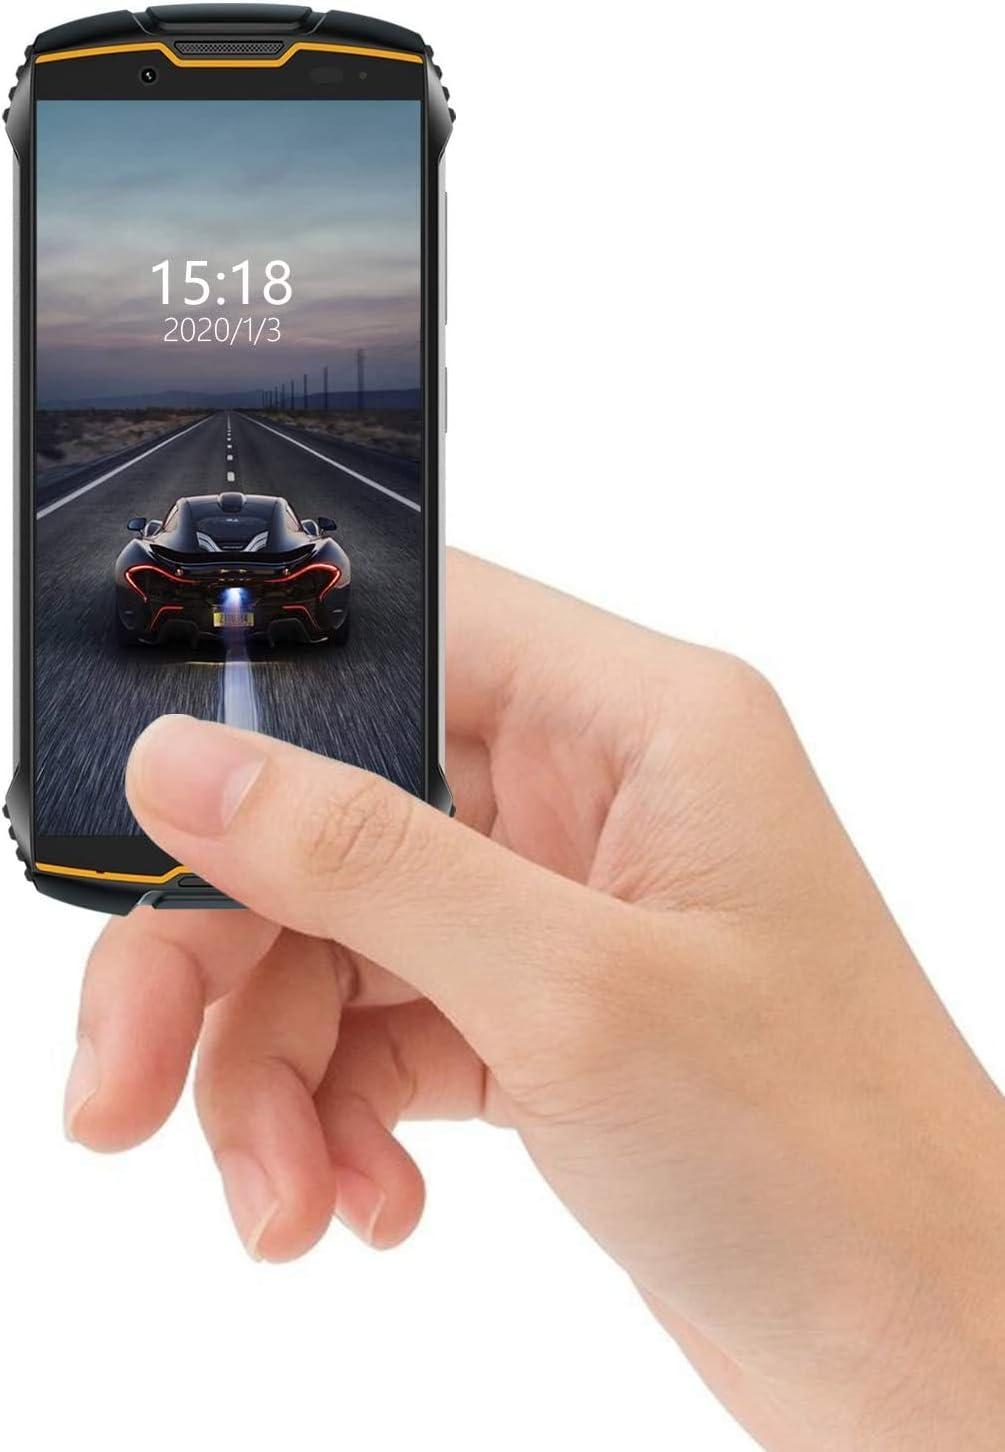 CUBOT King Kong Mini 4G teléfono IP68 Móvil Libre Impermeable Smartphone 4.0 Pulgadas Android 9.0 Dual SIM Quad-Core 13,0MP Cámara 3GB+32GB Quad-Core Amarillo, Naranja